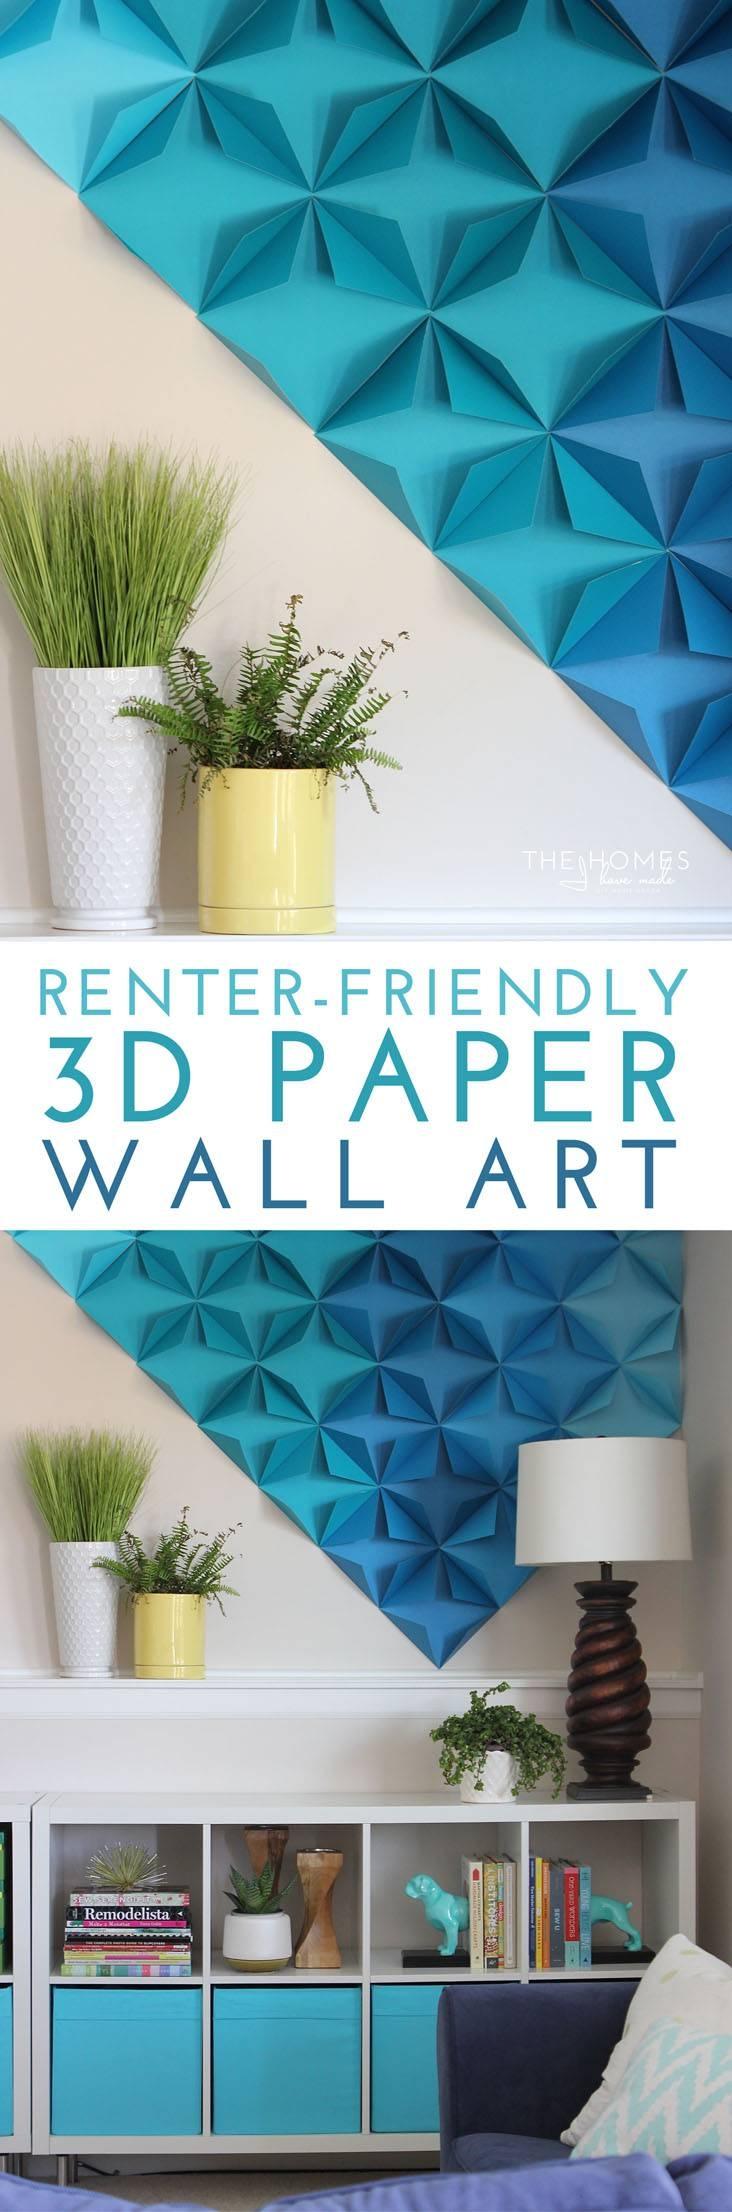 Renter Friendly 3D Paper Wall Art Throughout Current 3D Paper Wall Art (View 20 of 25)